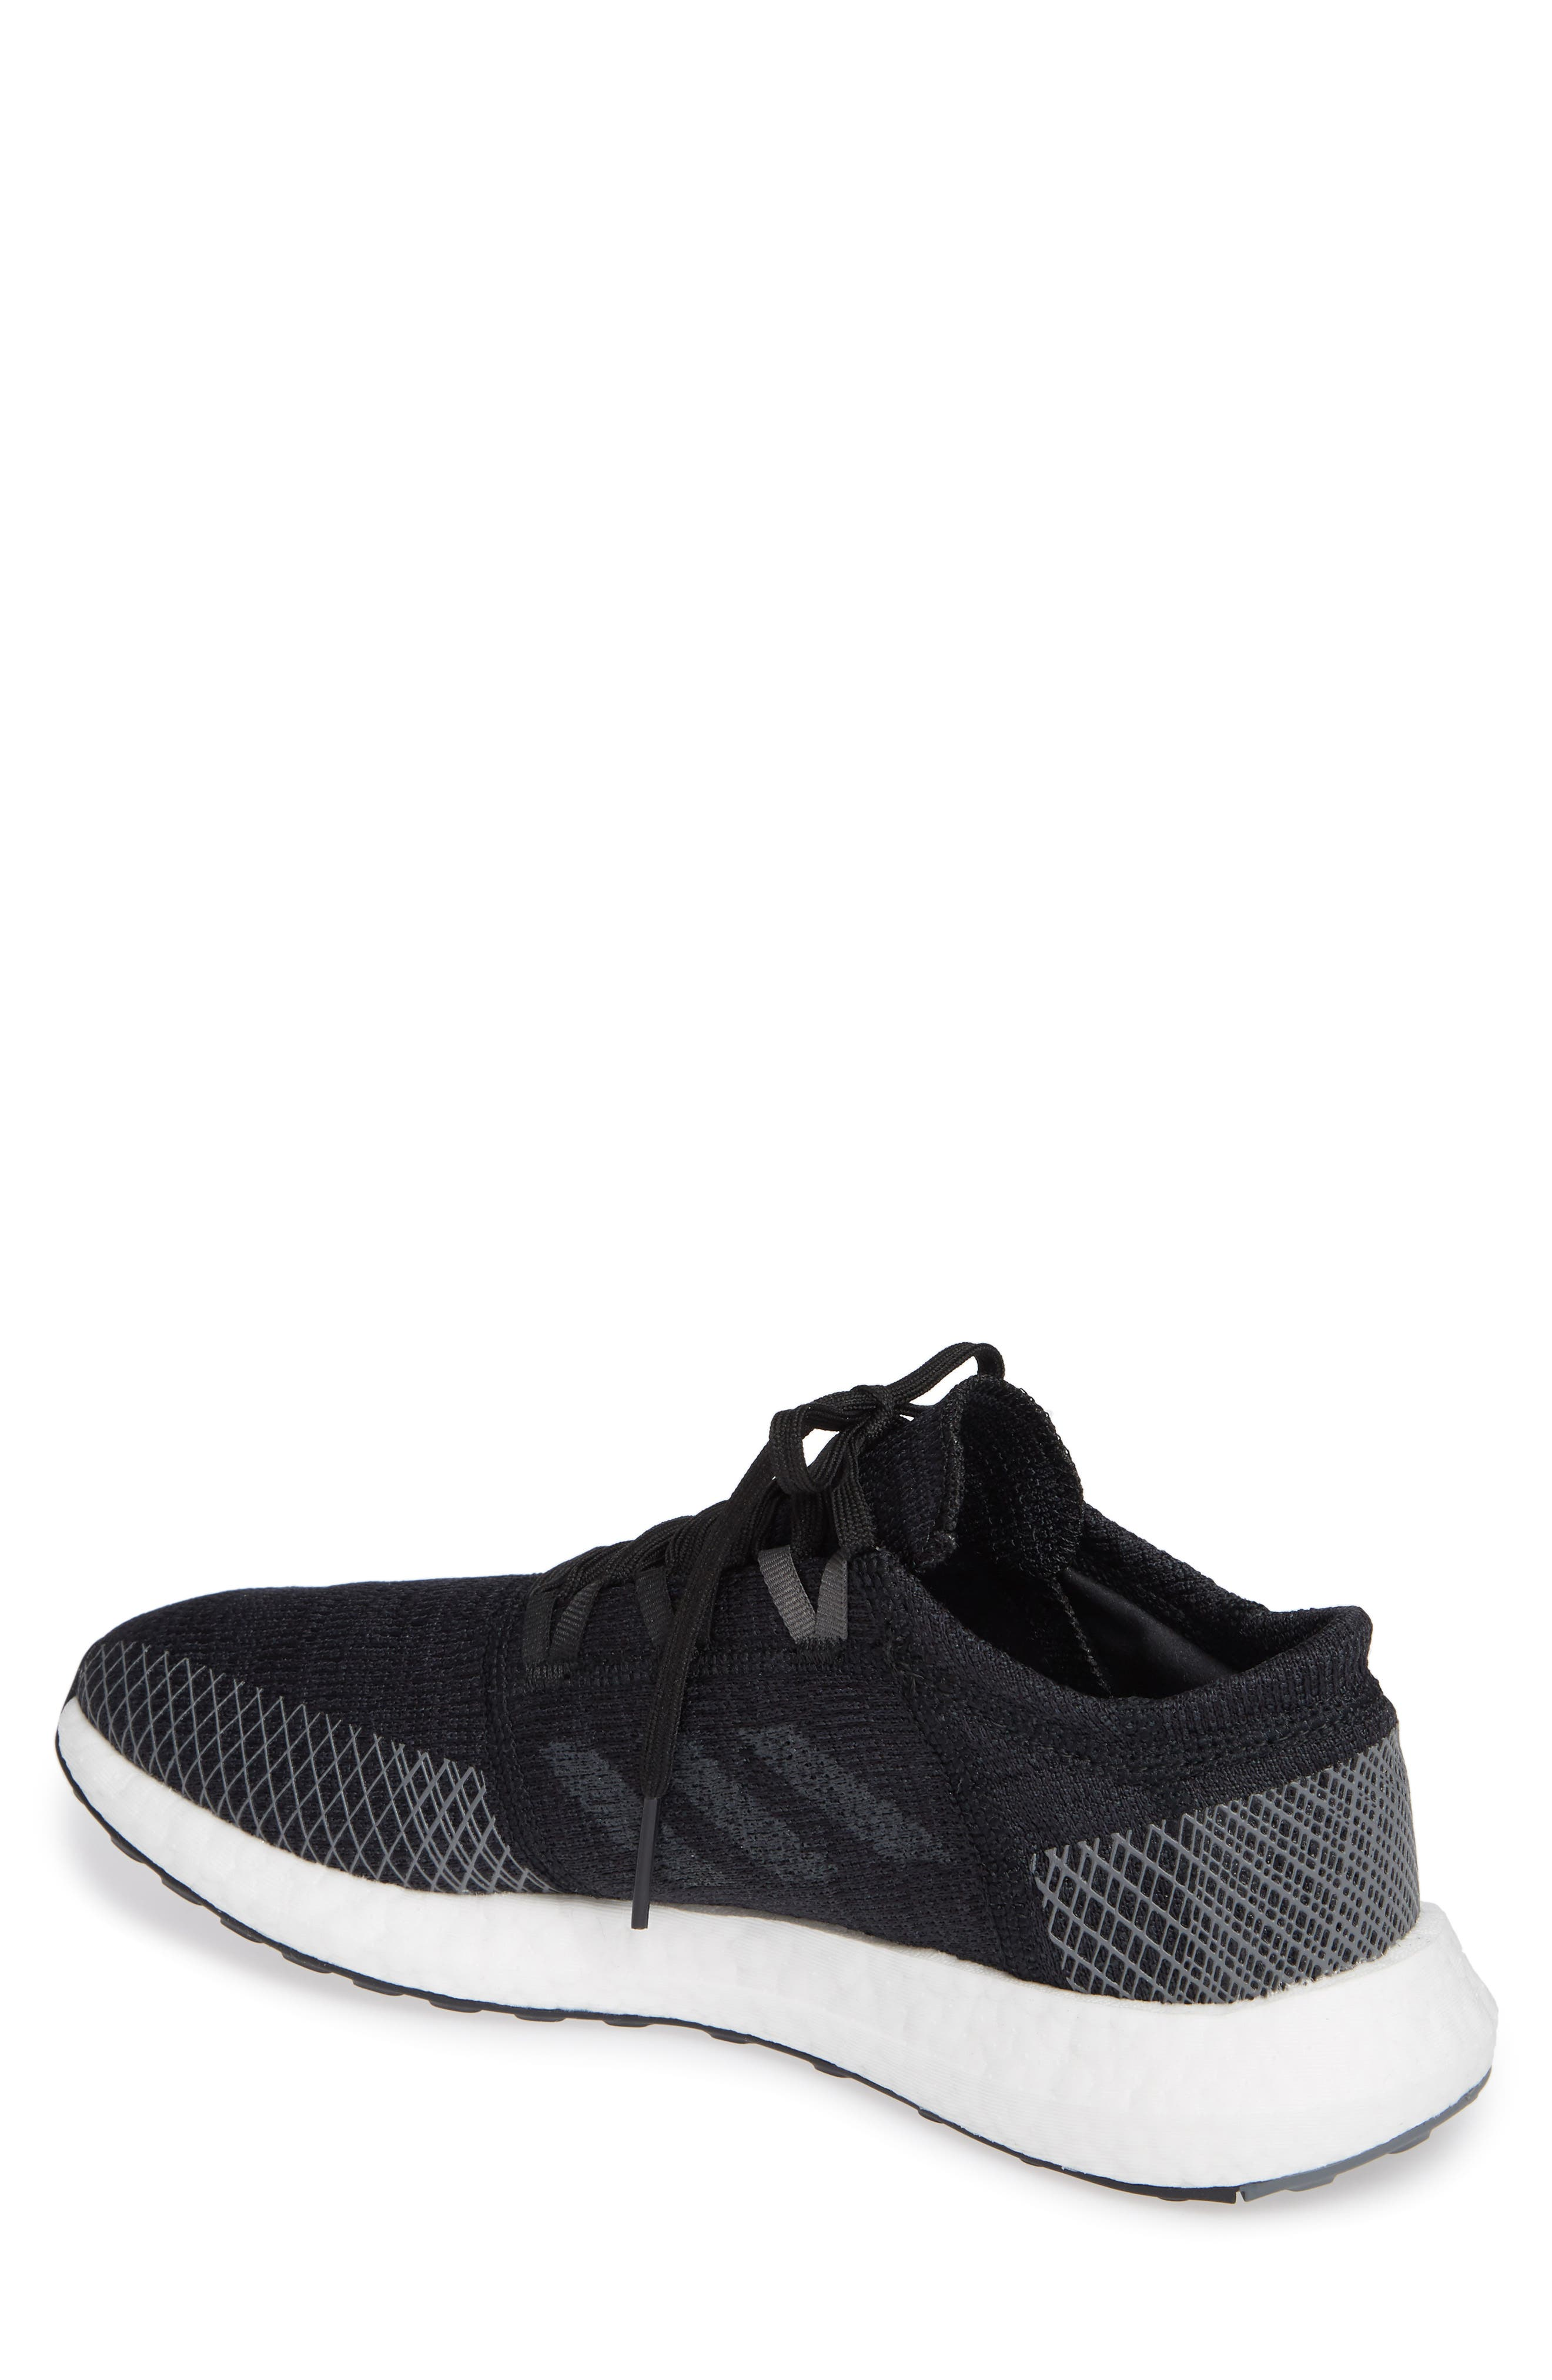 PureBoost GO Running Shoe,                             Alternate thumbnail 2, color,                             BLACK/ GREY